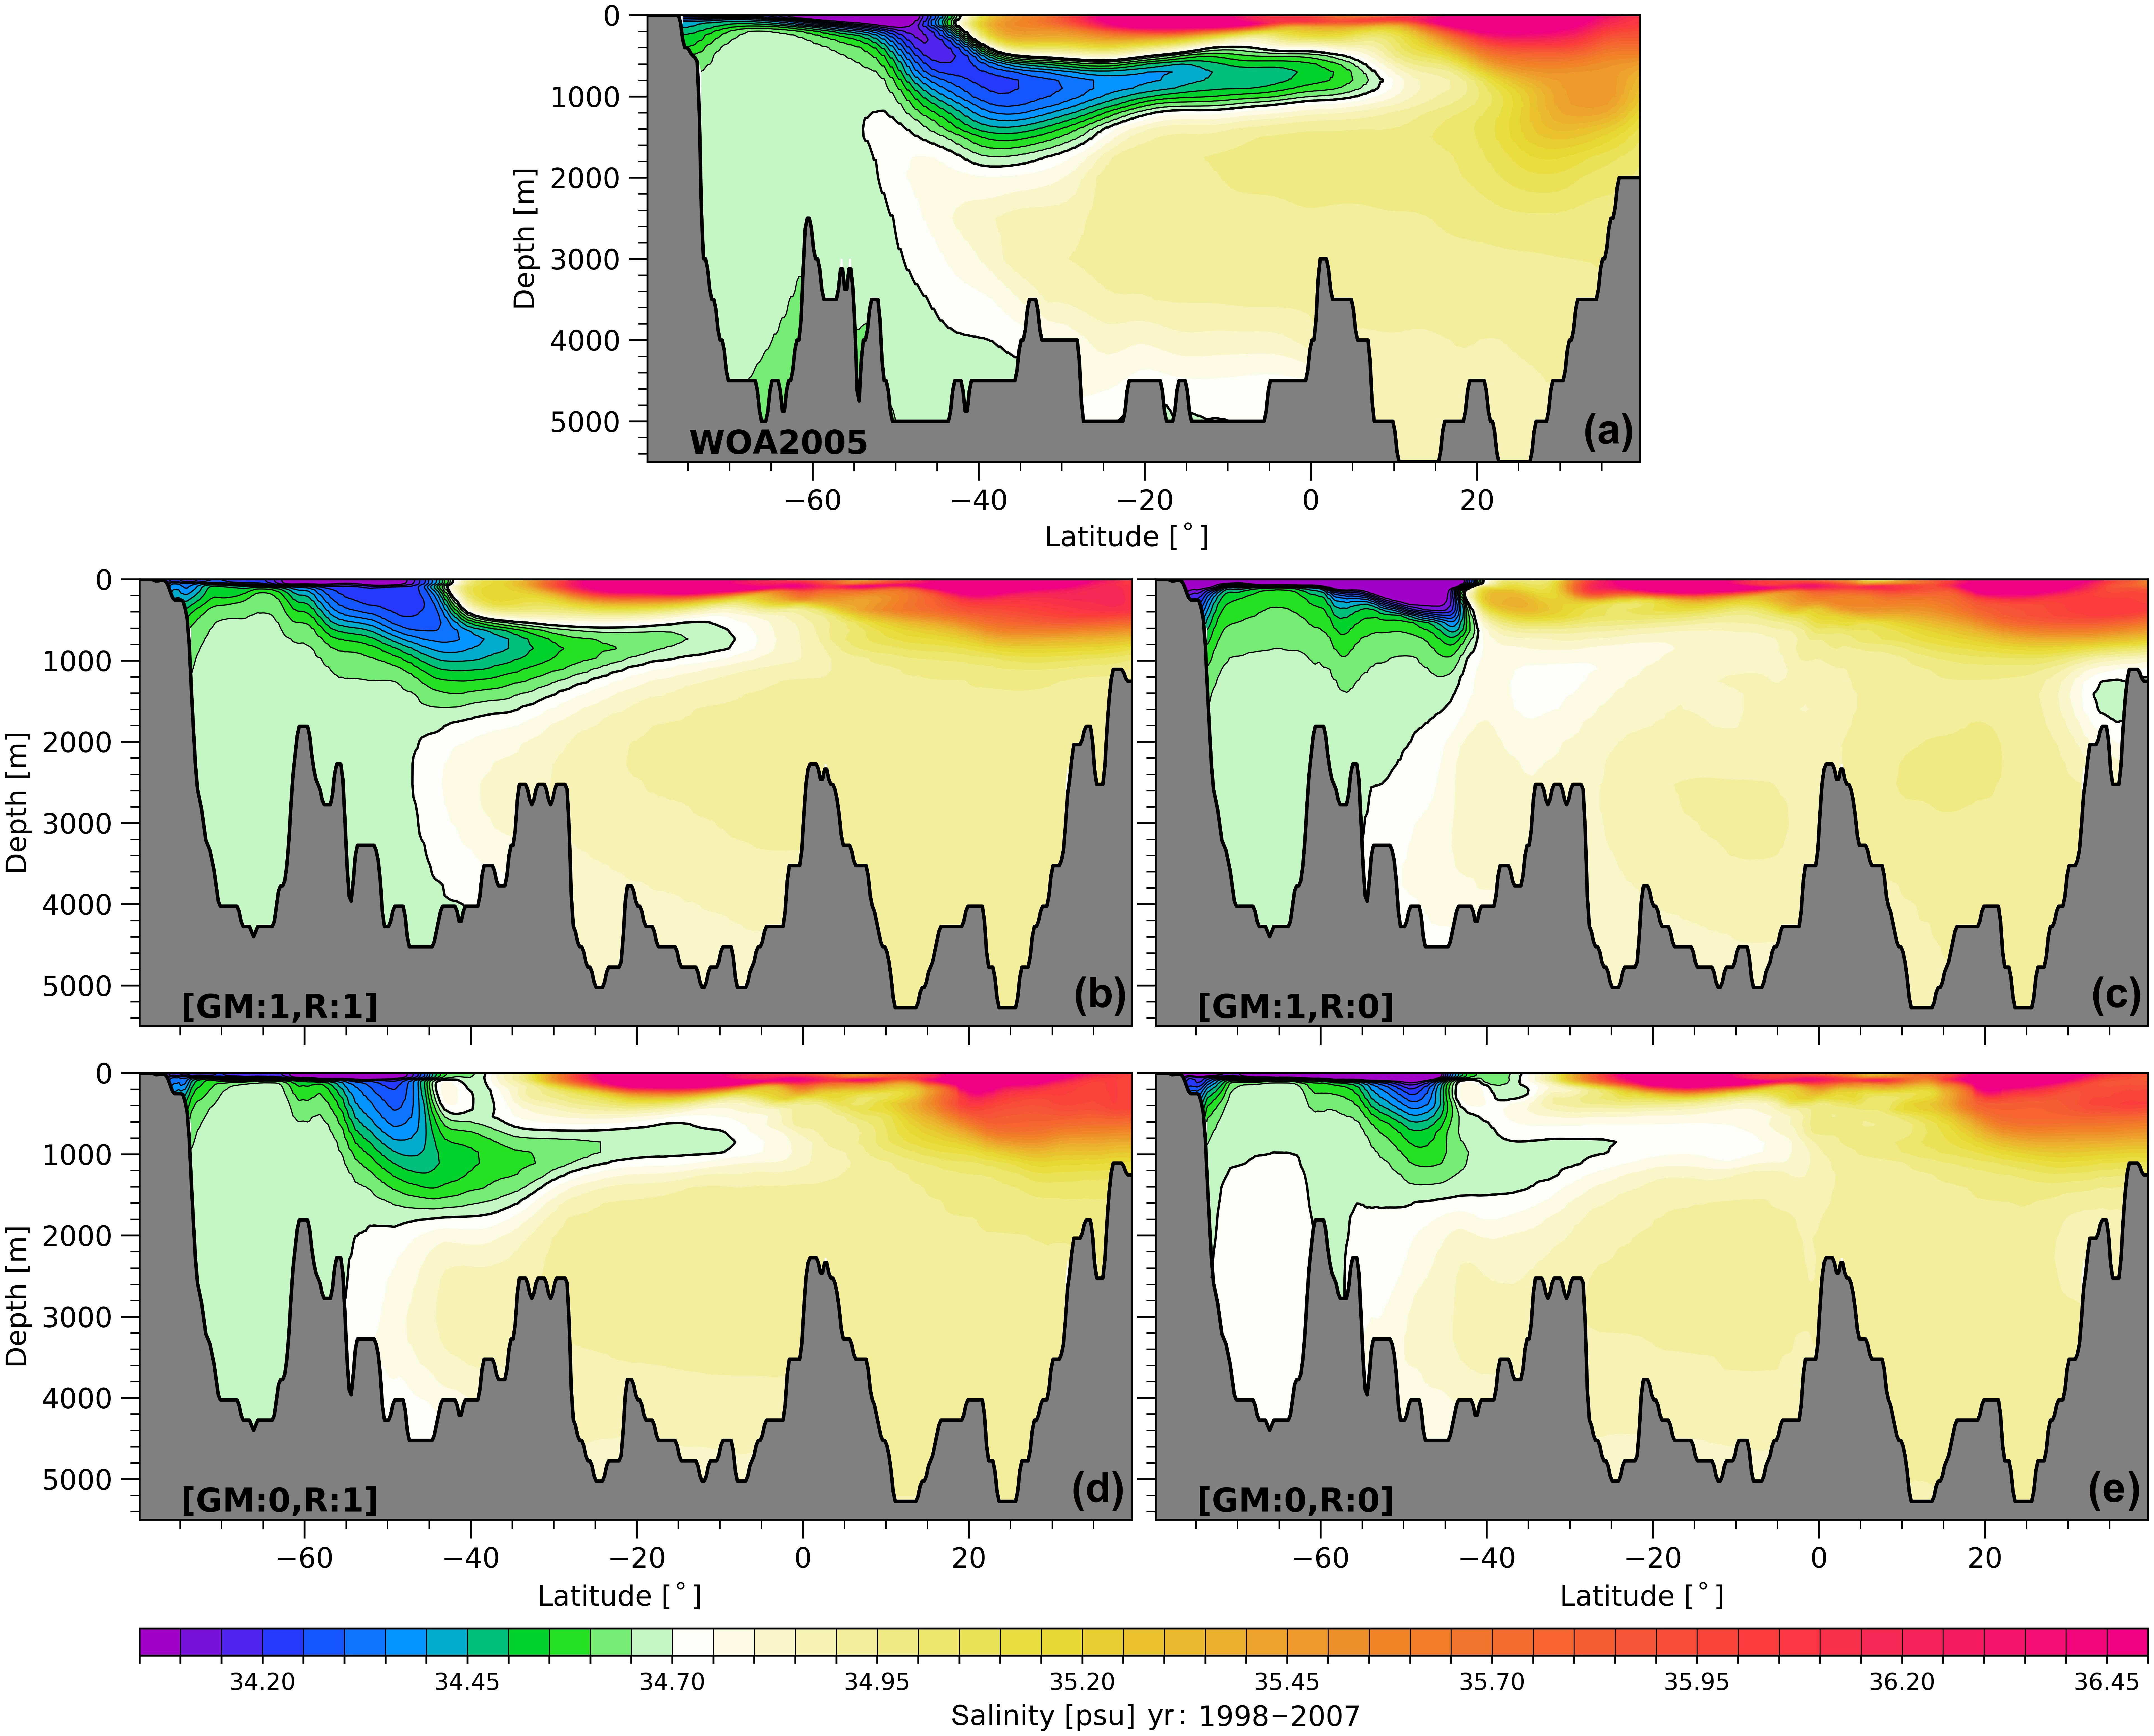 GMD - Assessment of the Finite-volumE Sea ice-Ocean Model